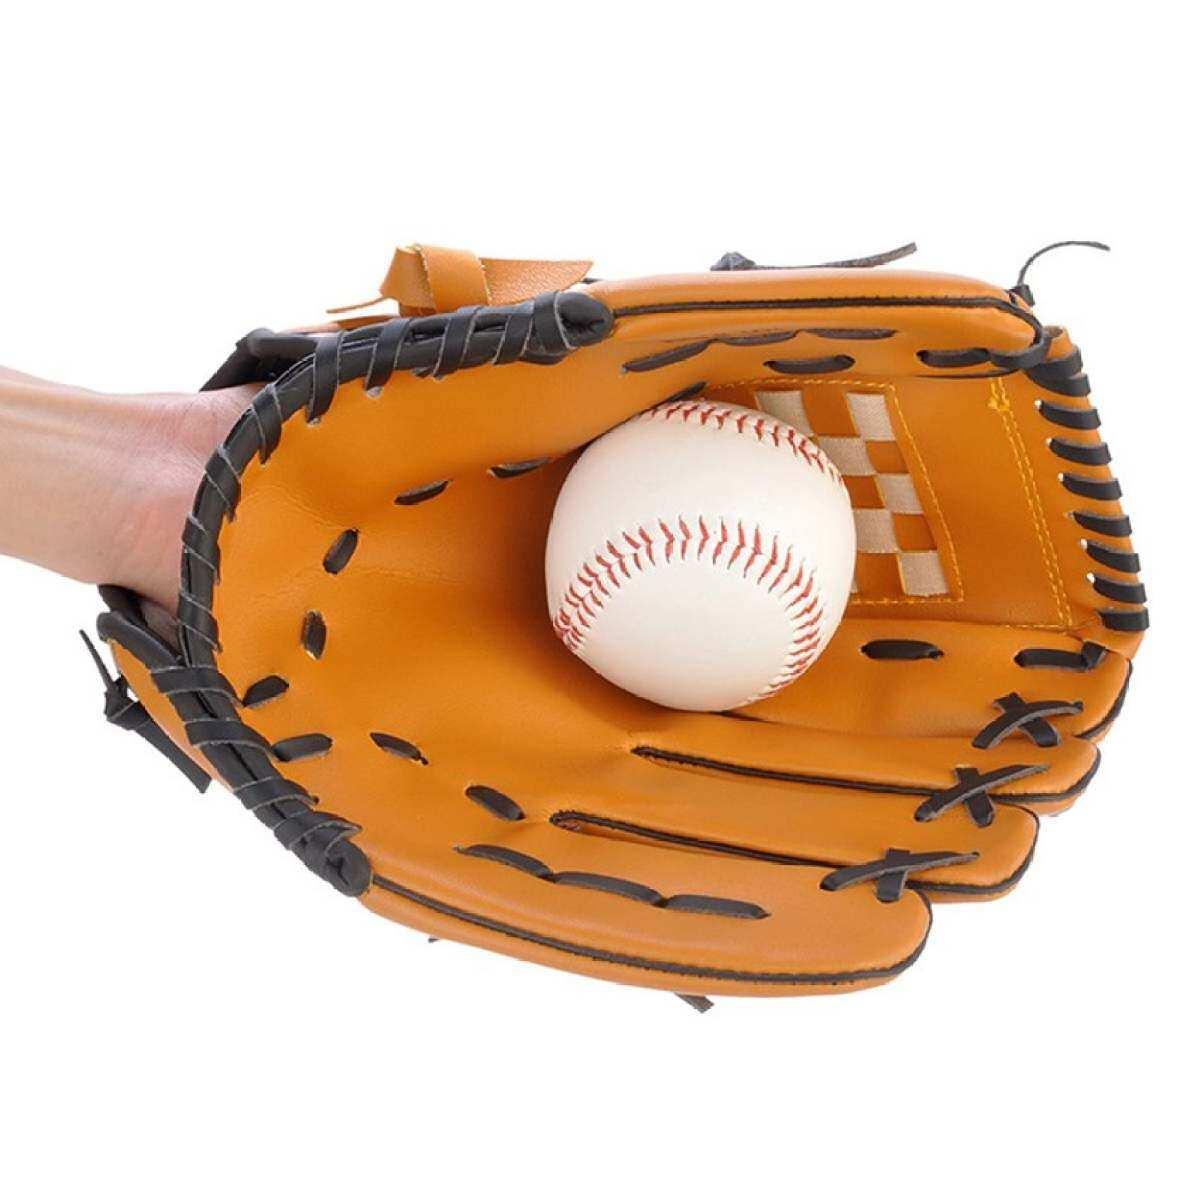 Baseball Training Practice Gloves Left Hand Pvc Softball 12.5 Glove Artificial Pitcher Leather Baseball Unisex By Rjpgrbpwl.